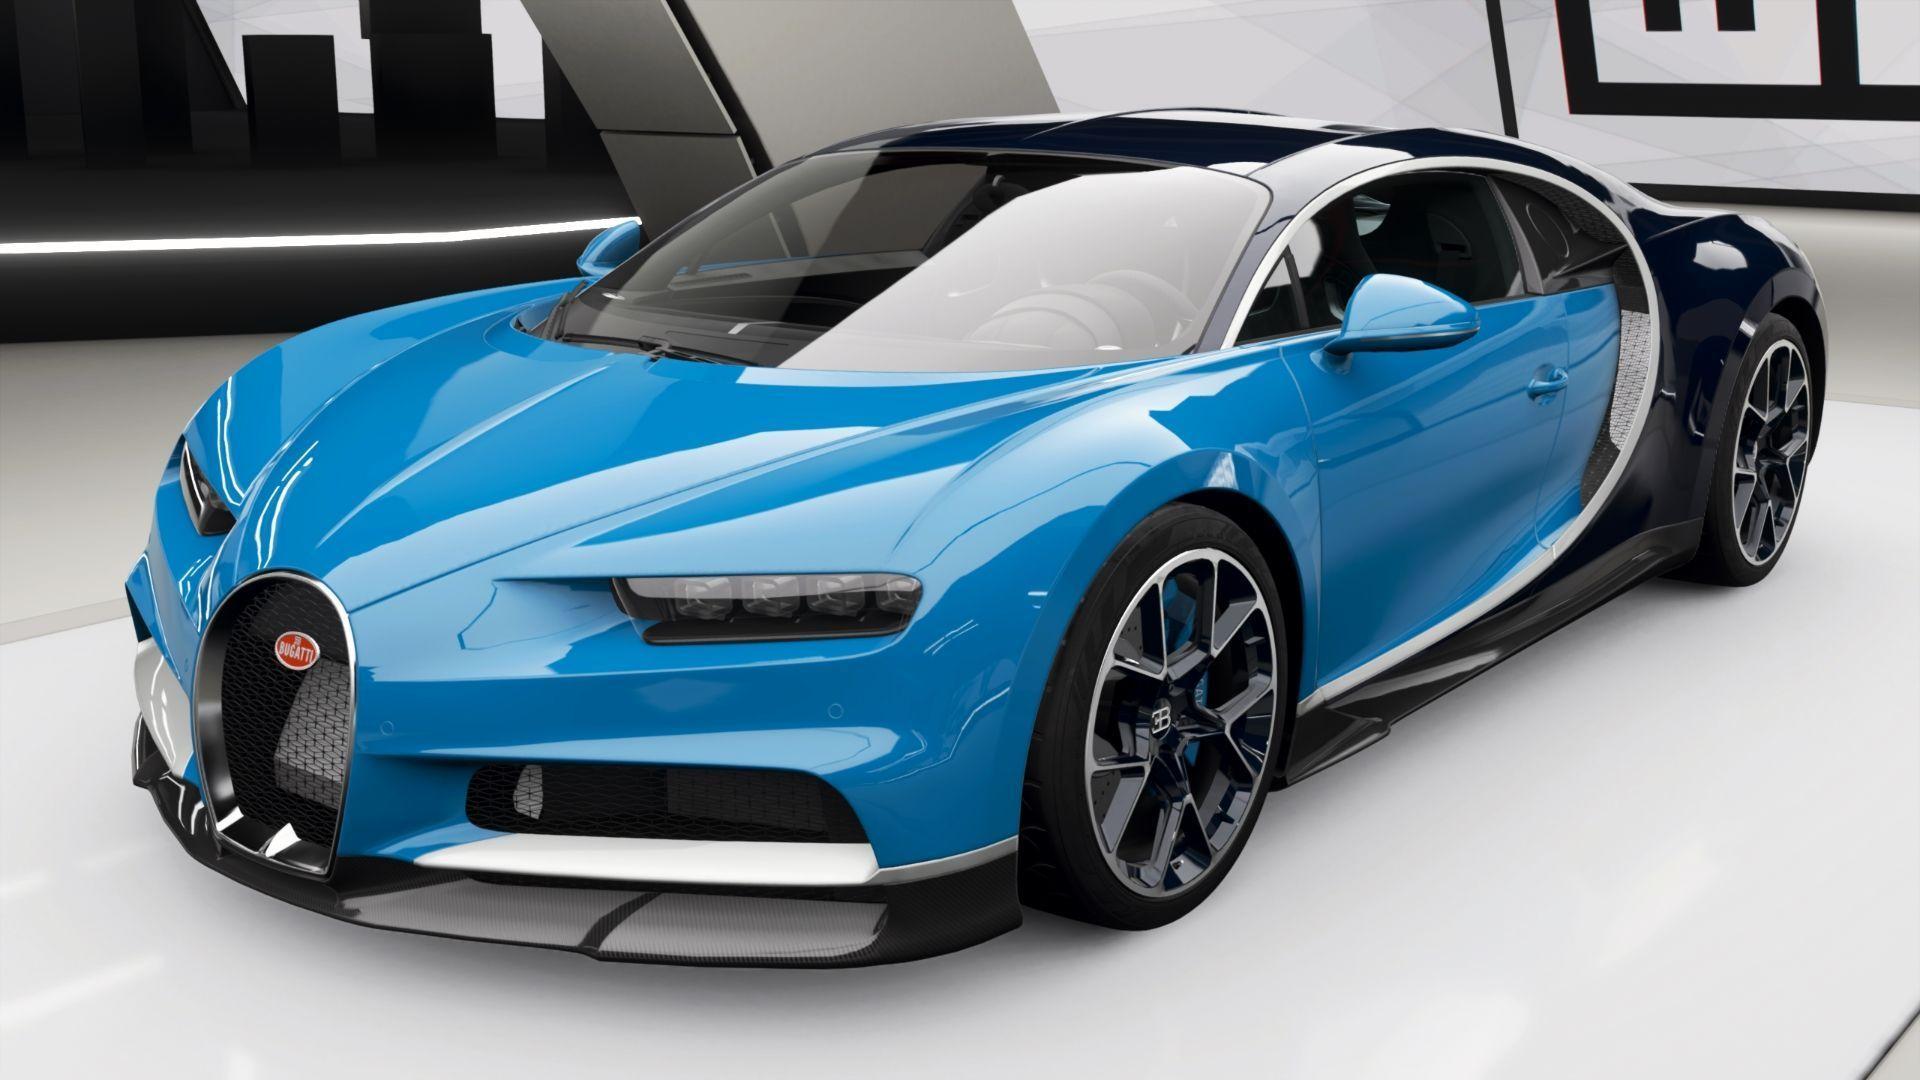 Bugatti Chiron #bugattichiron Bugatti Chiron #bugattichiron Bugatti Chiron #bugattichiron Bugatti Chiron #bugattichiron